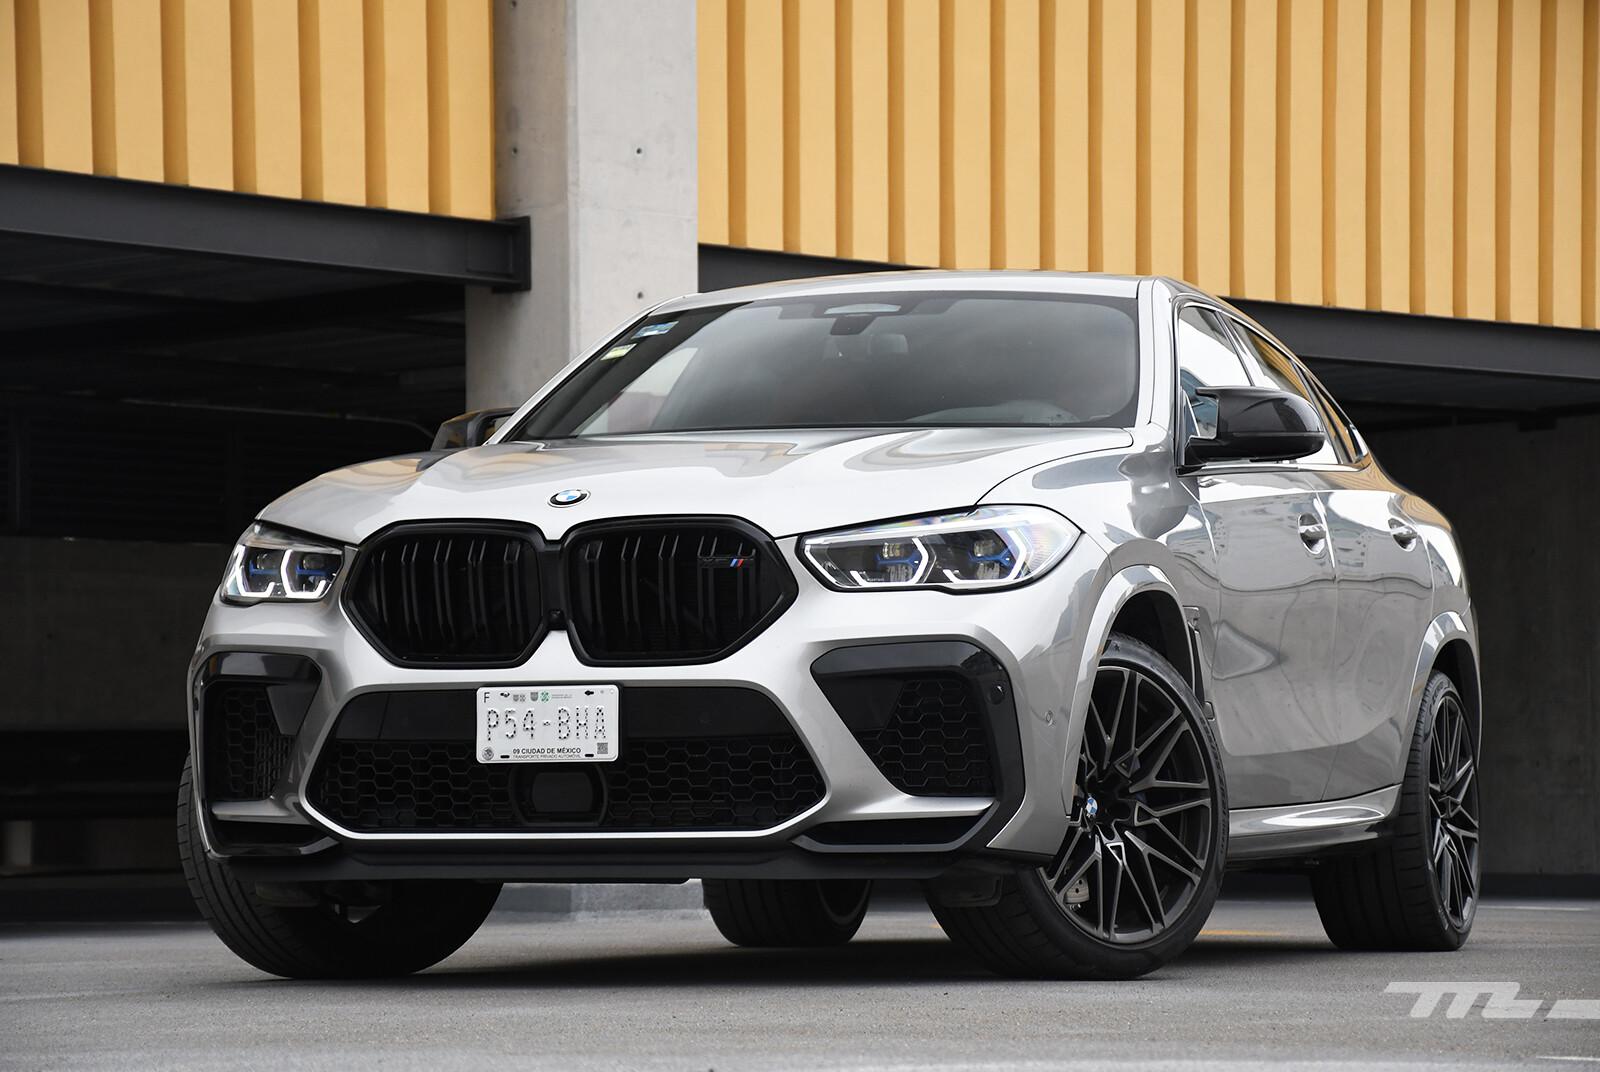 Foto de BMW X6 M Competition 2021 (prueba) (2/27)